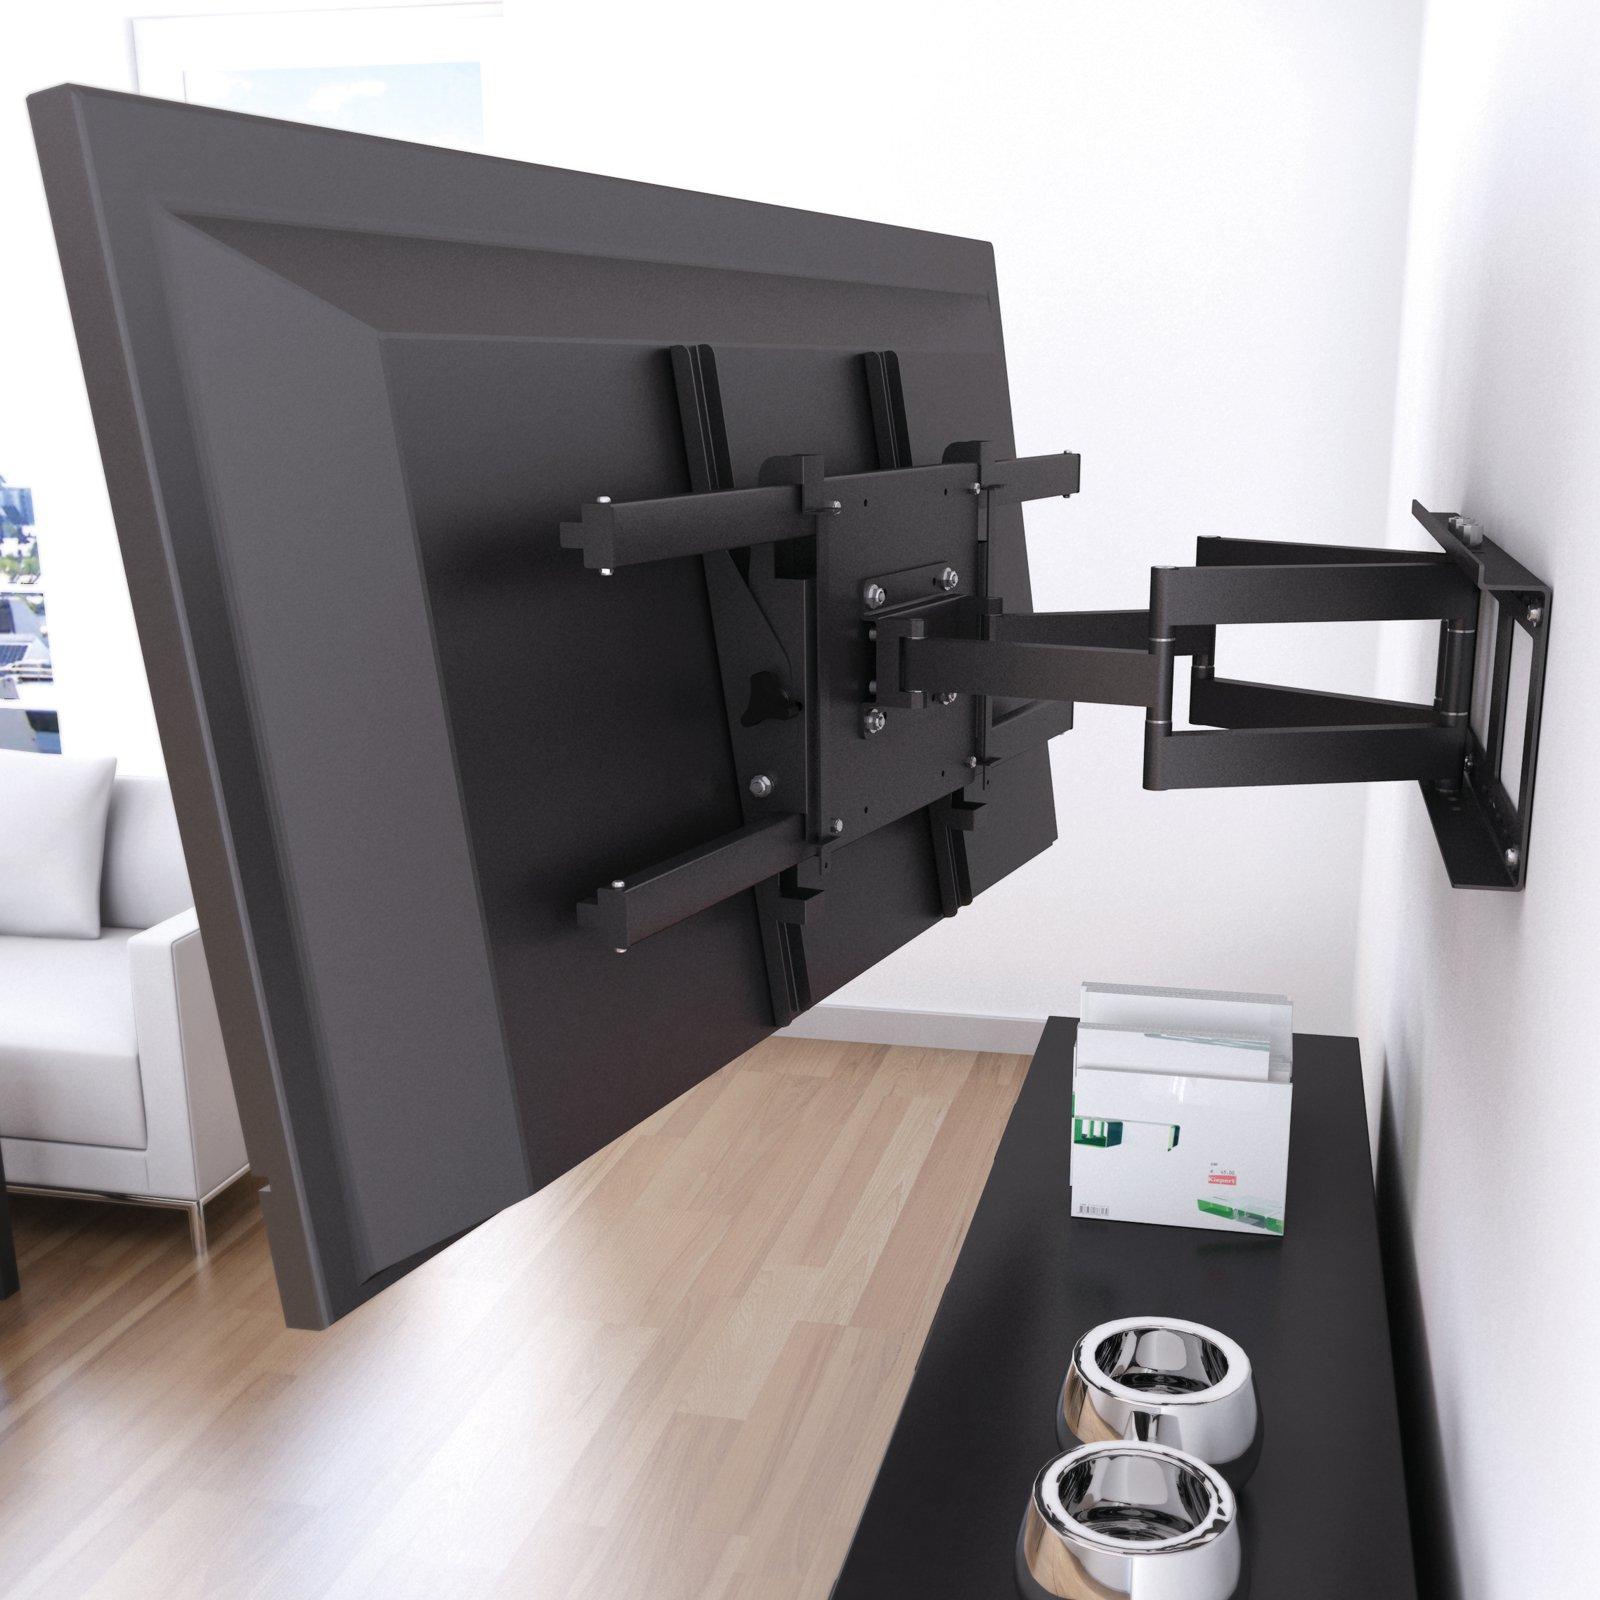 Tv Wall Mounting Brace Yourself